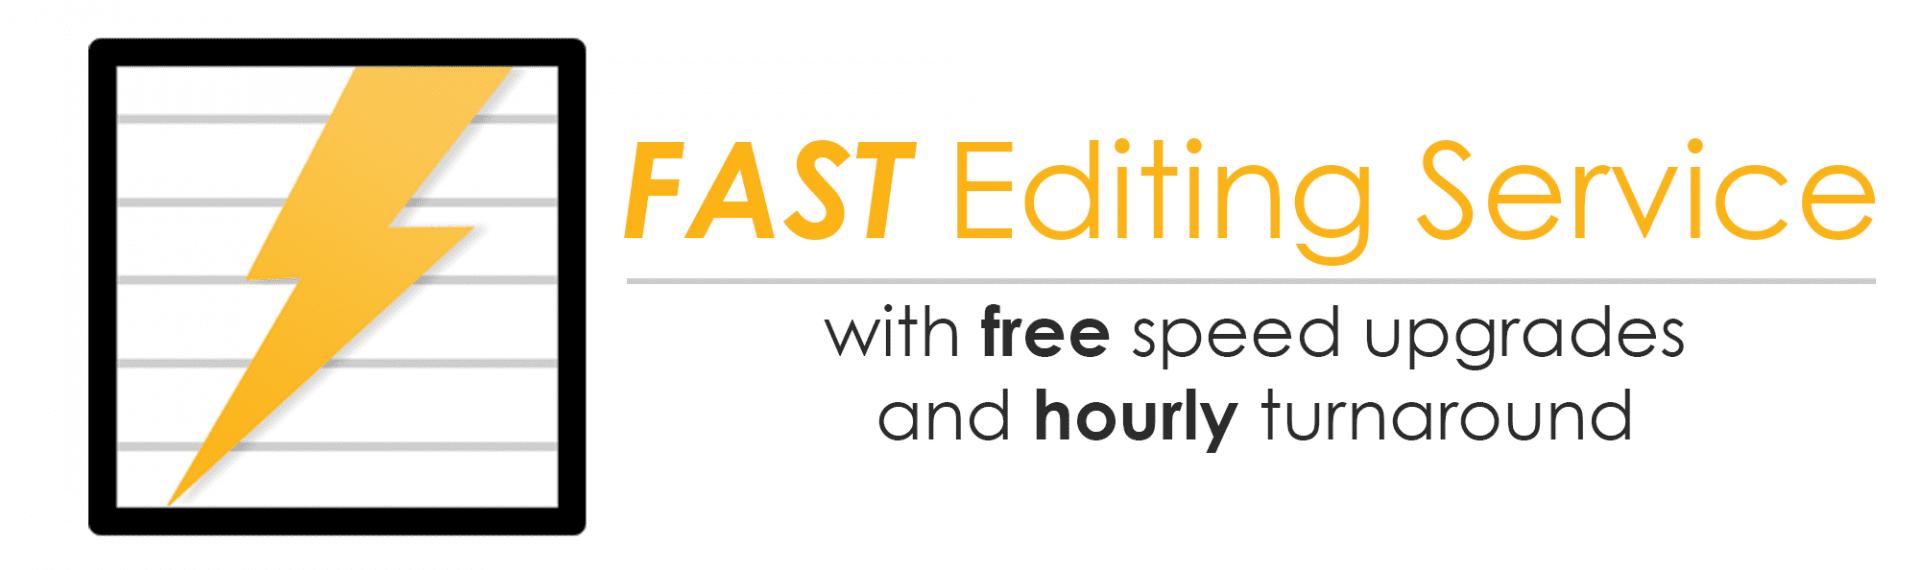 Fast Editing Service